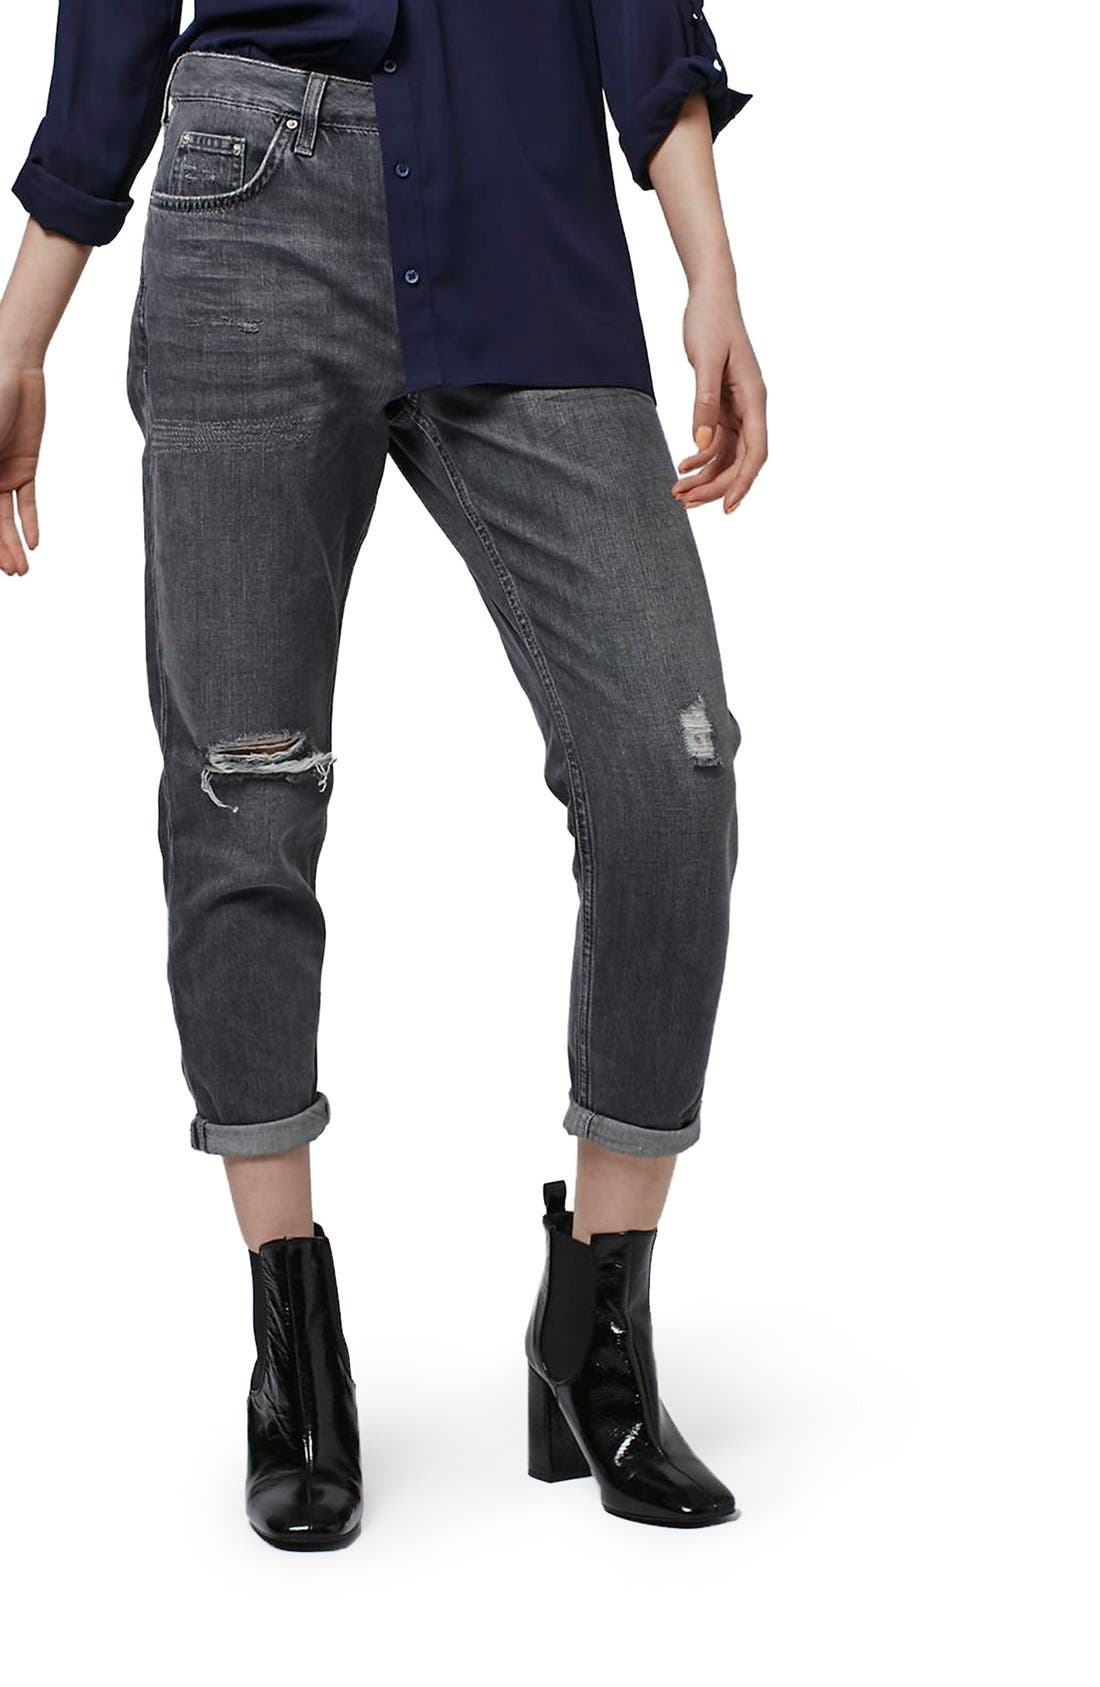 Main Image - Topshop Moto 'Hayden' Ripped Boyfriend Jeans (Petite)